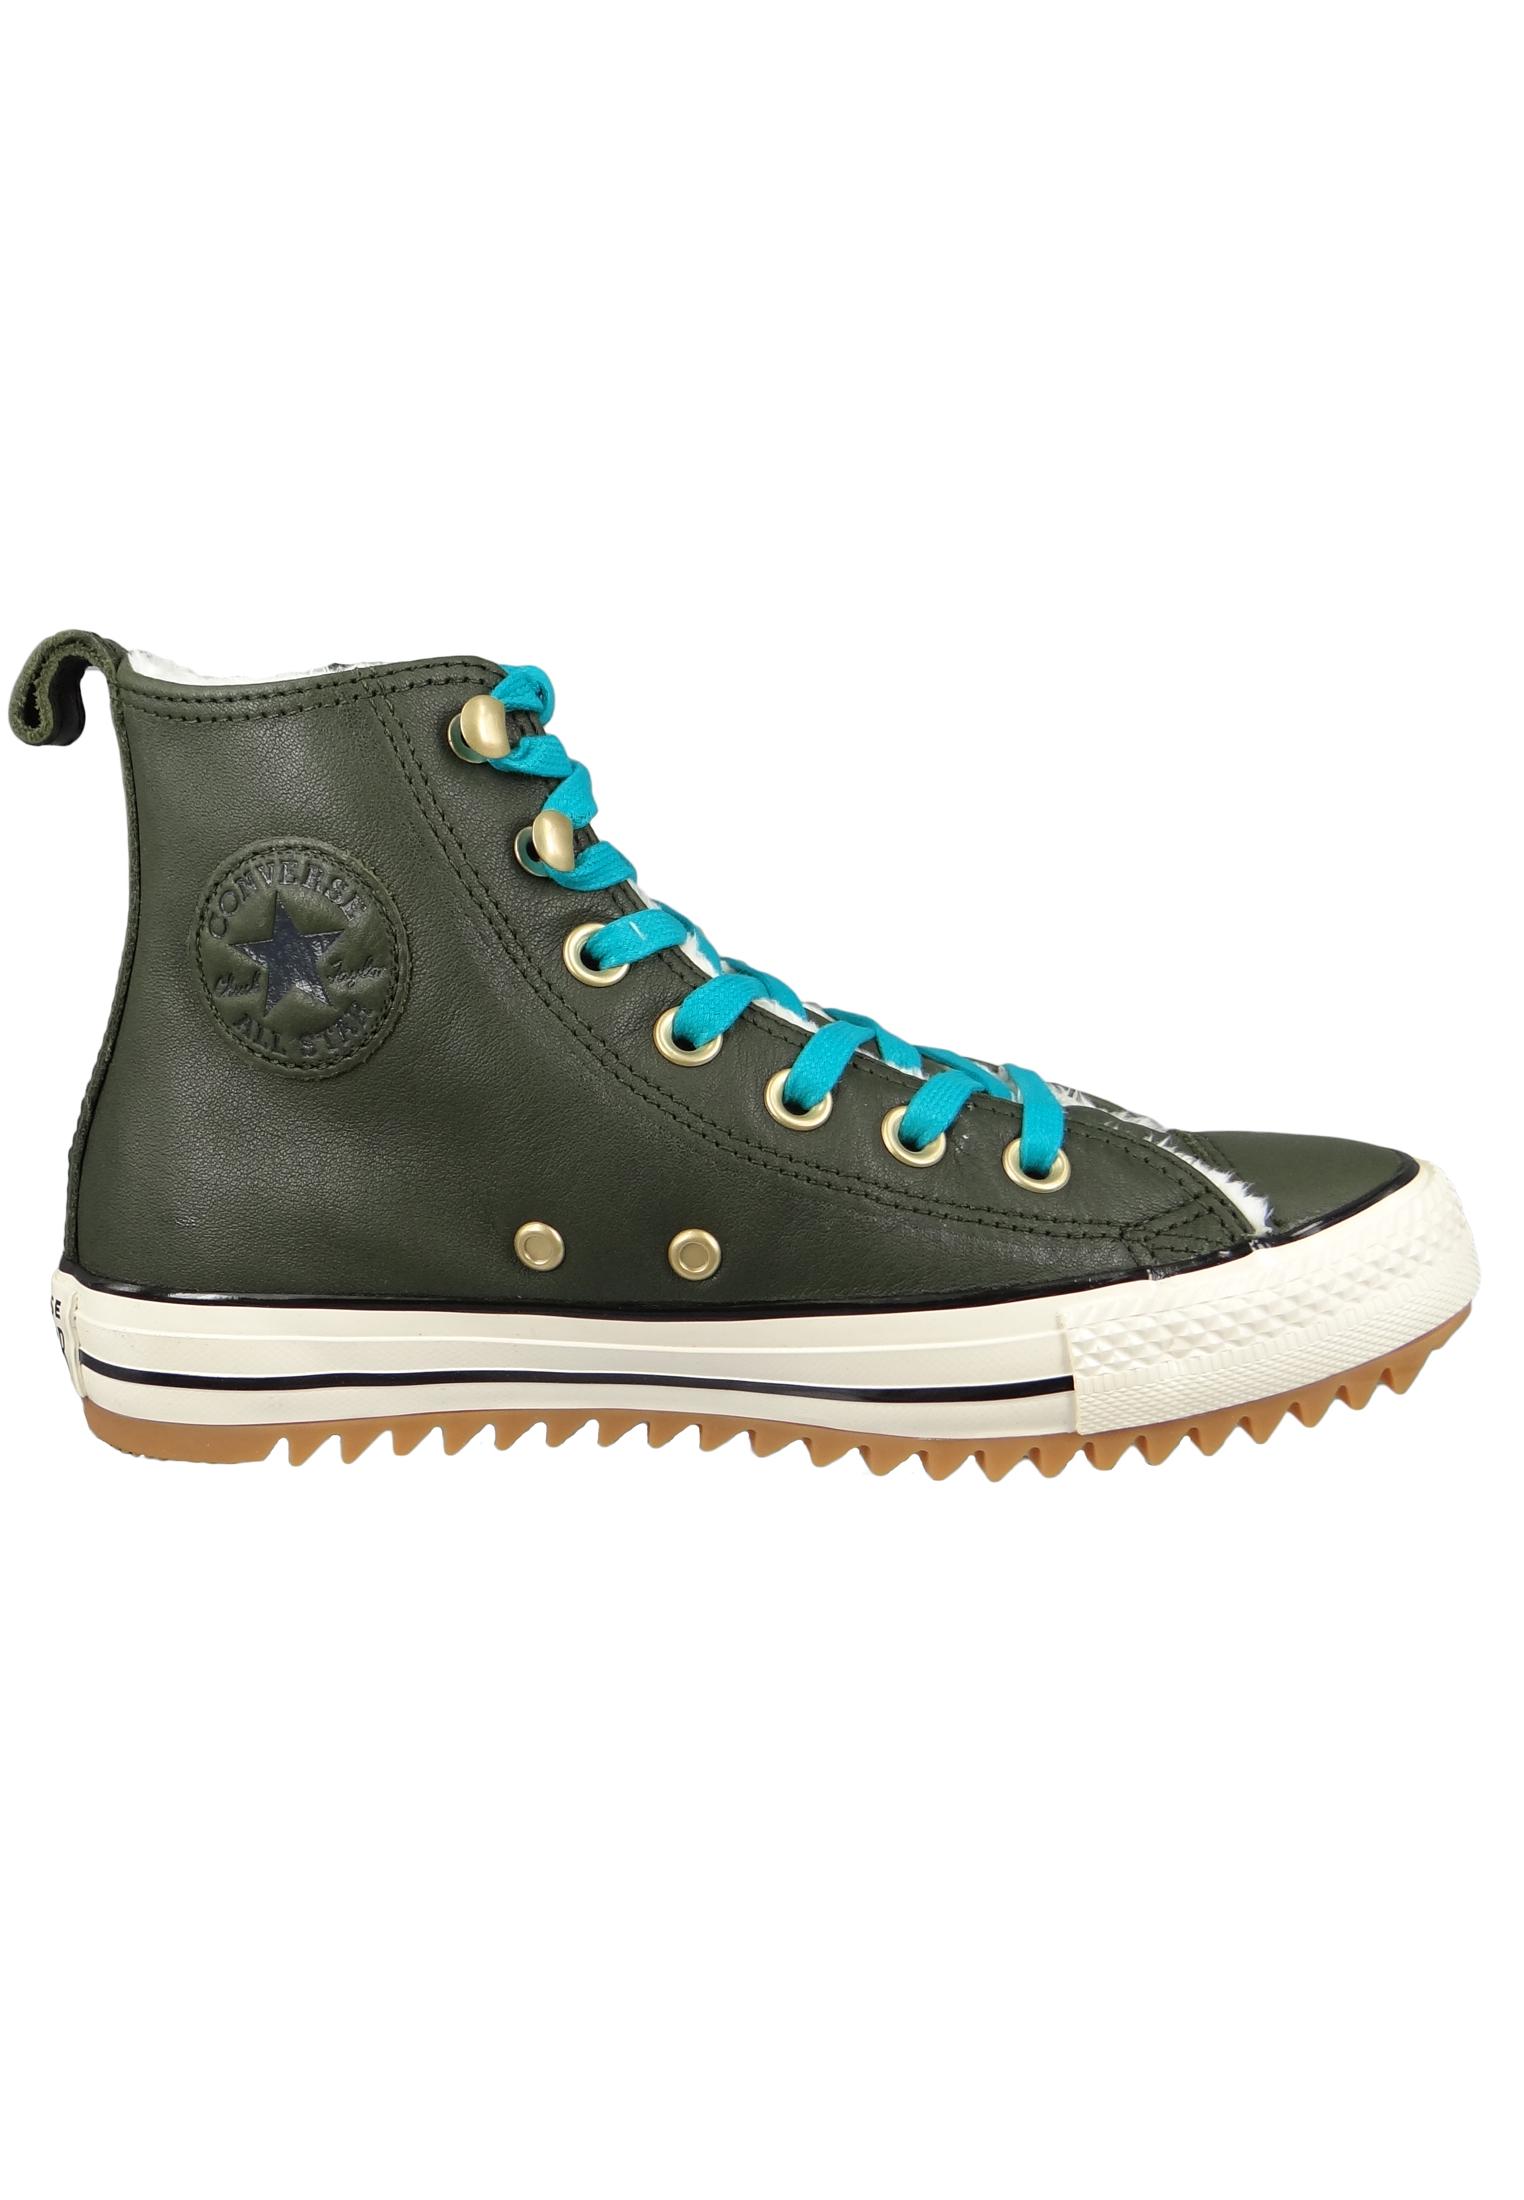 fe01b25704 Converse Chucks 162478C Grün Leder Chuck Taylor All Star Hiker Boot Utility  Green Rapid Teal –